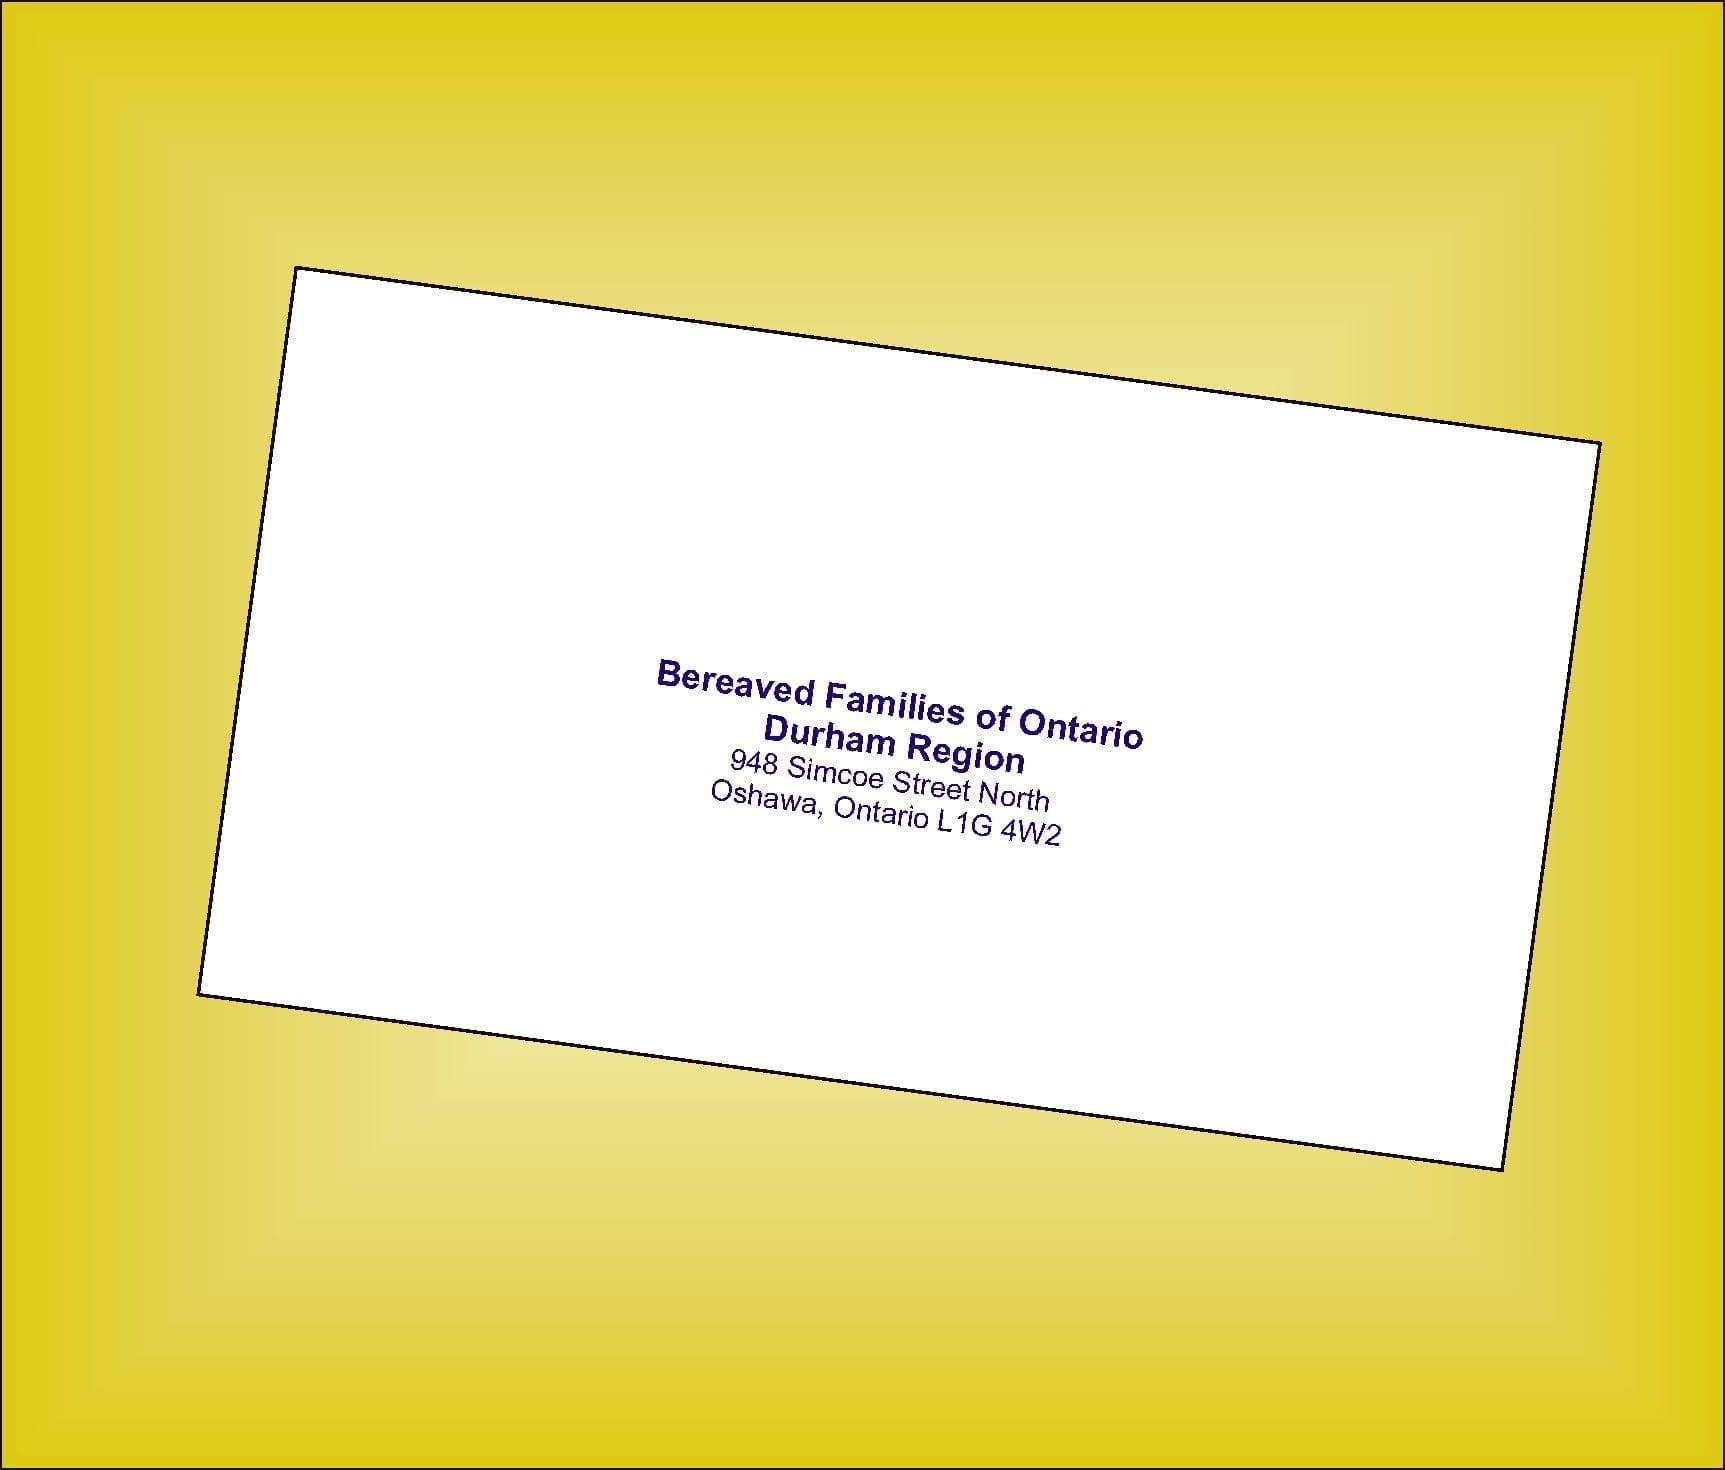 Envelope Special